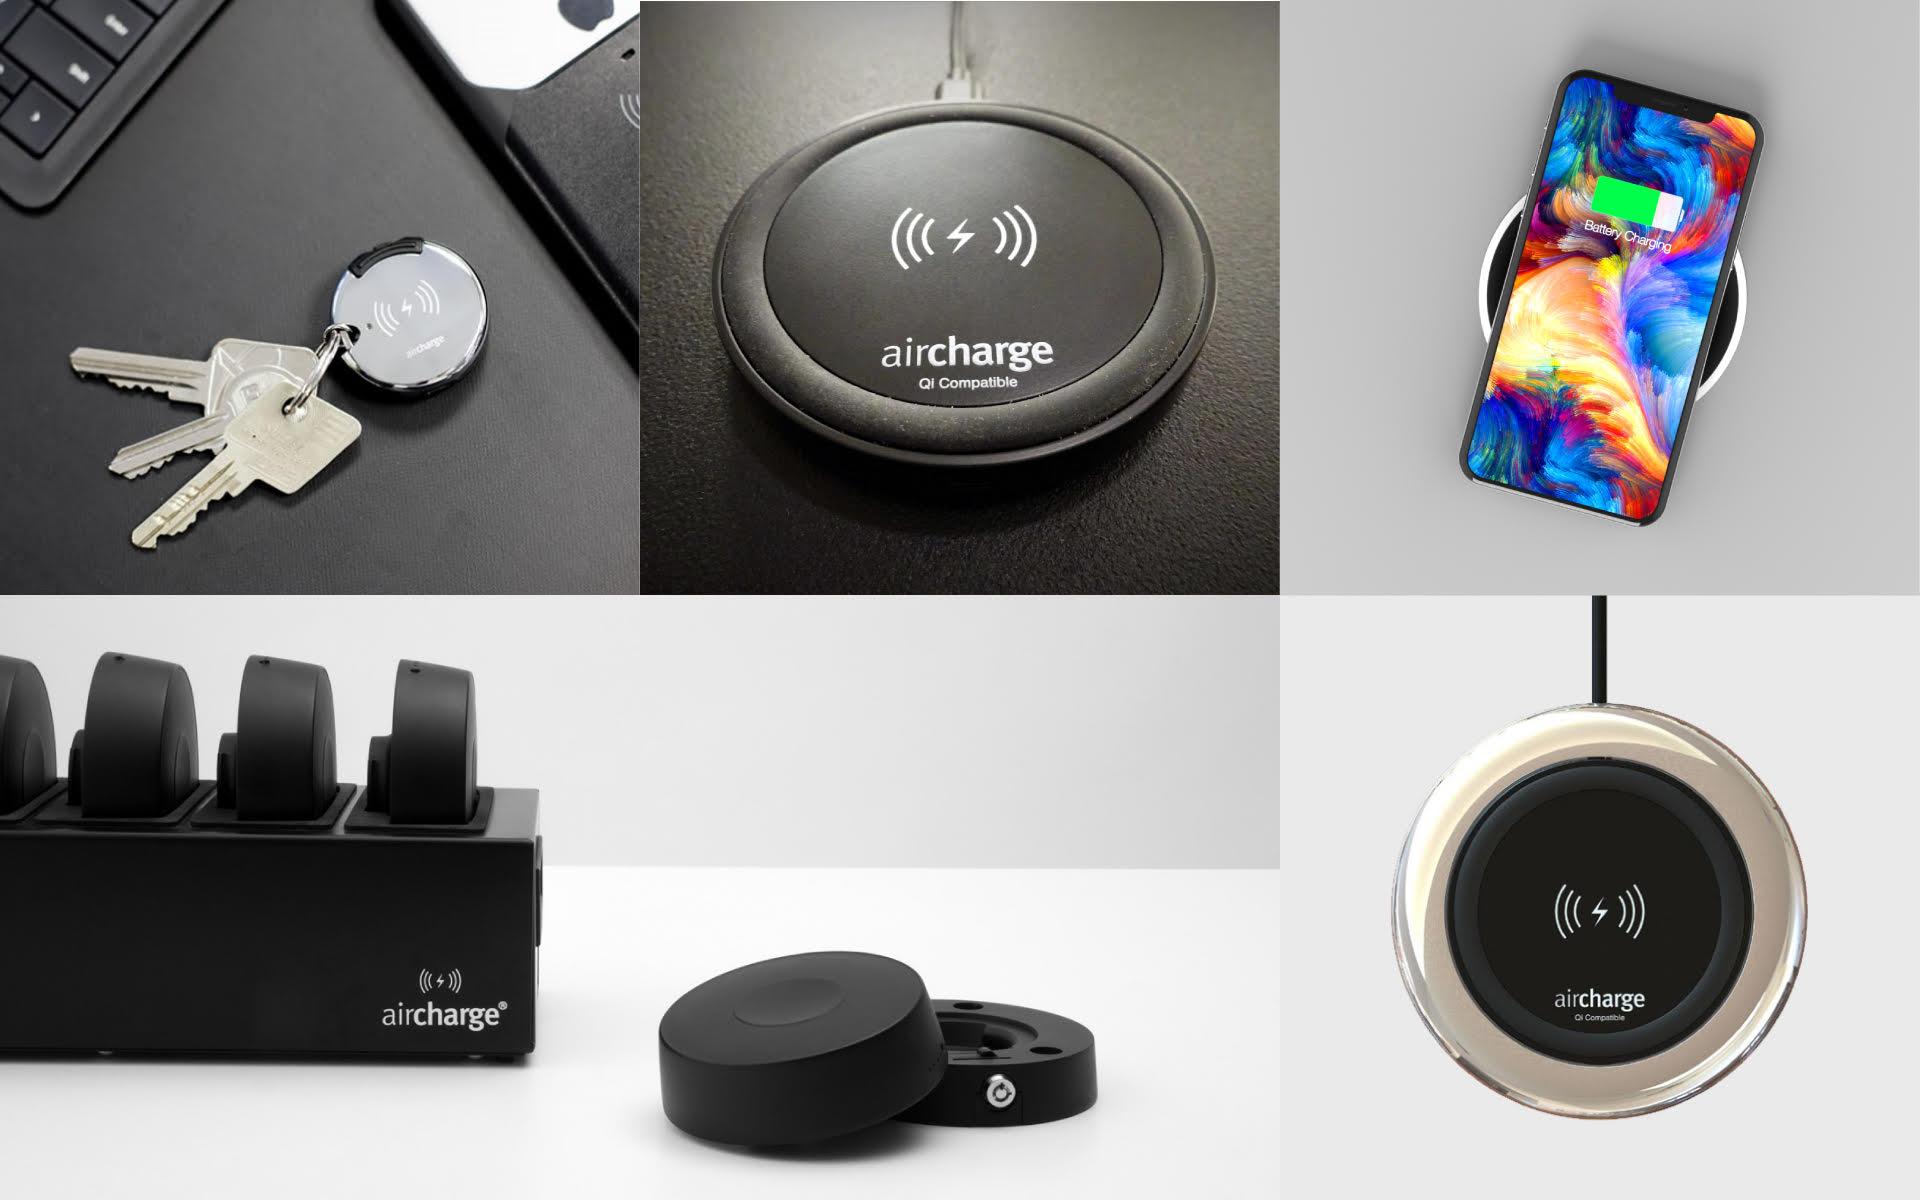 qi-products-designed-by-jonesandpartners.jpg